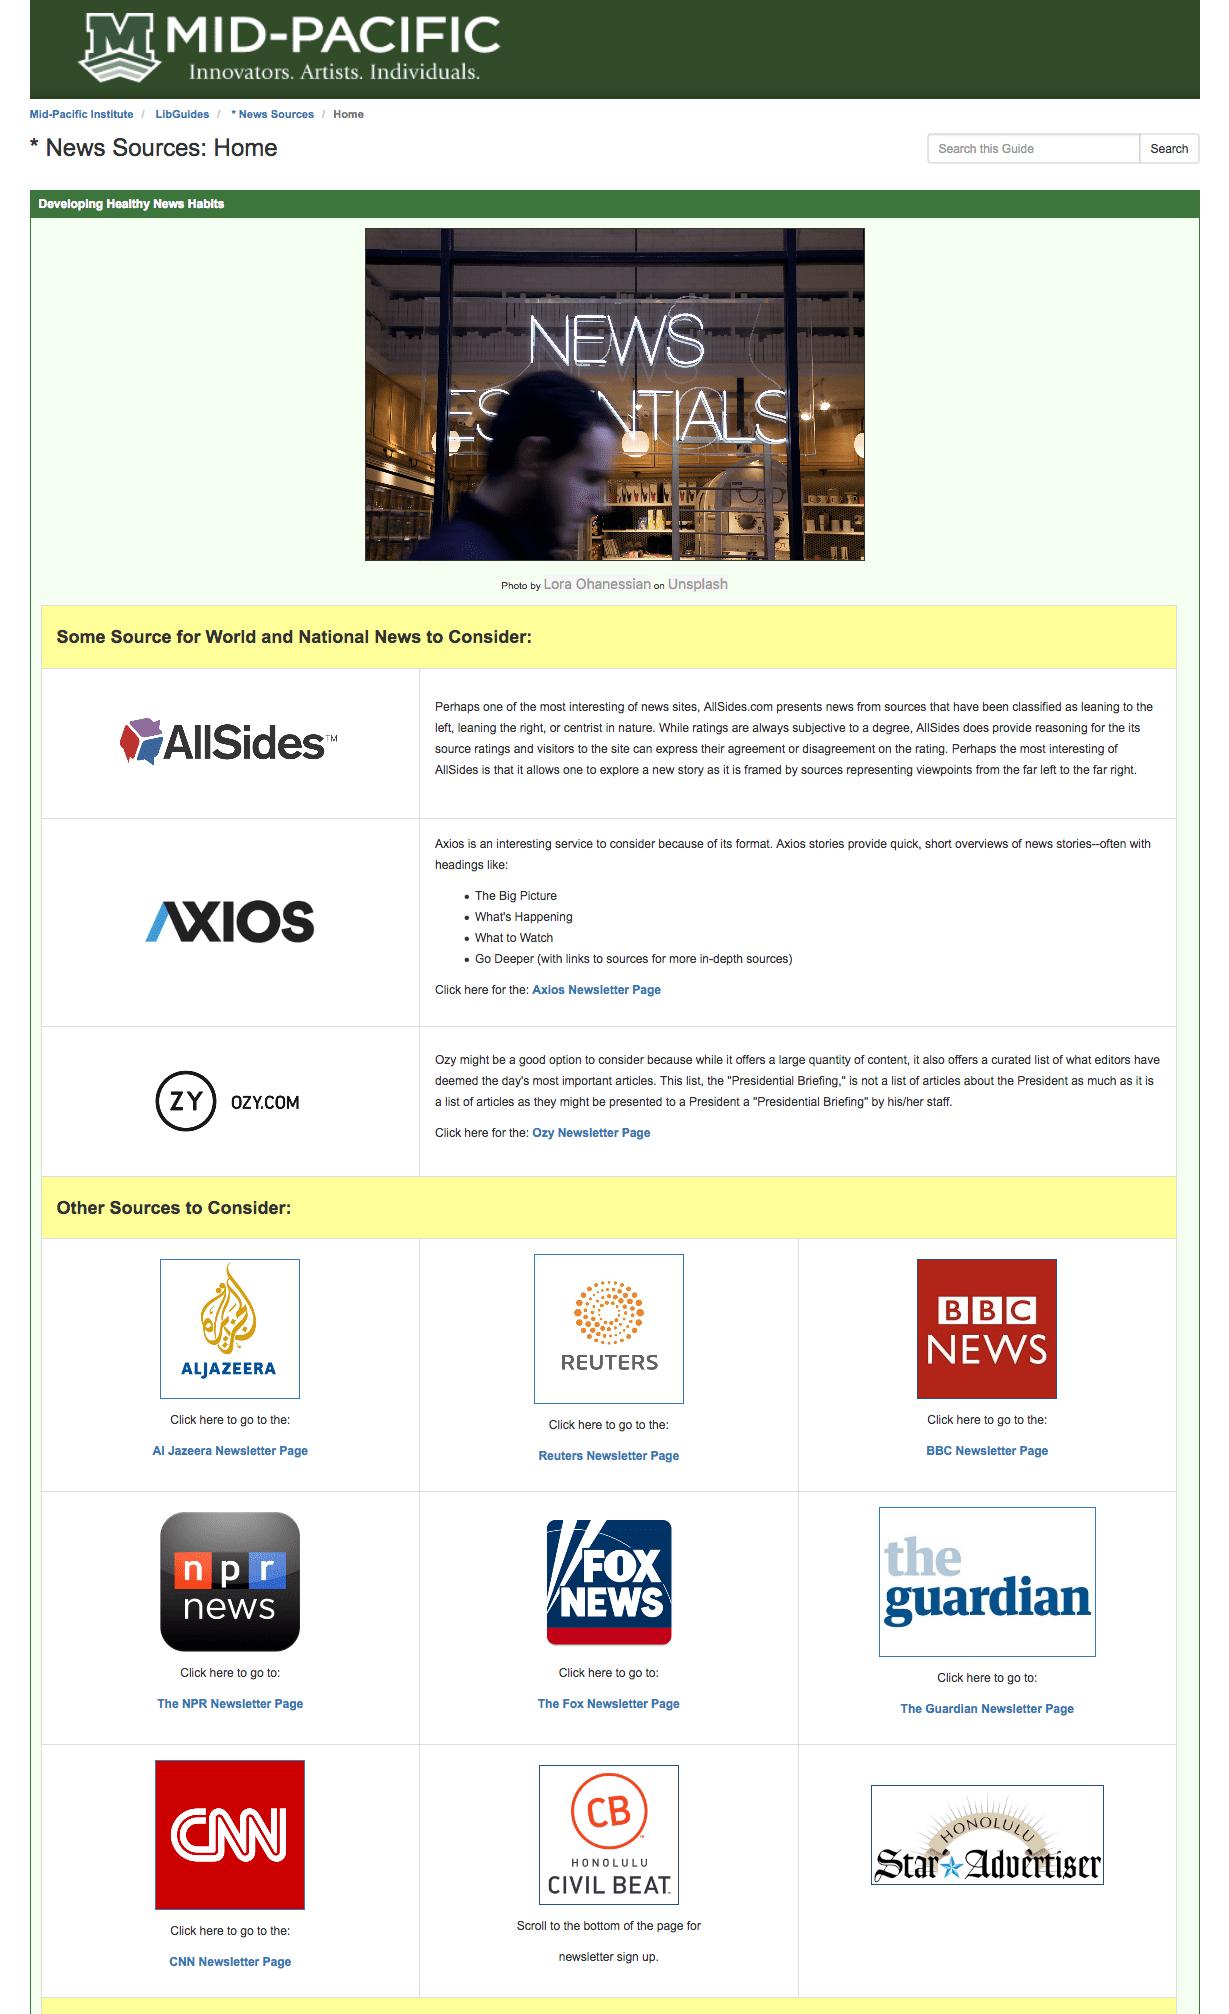 screenshot_2019-01-22-libguides-news-sources-home.png